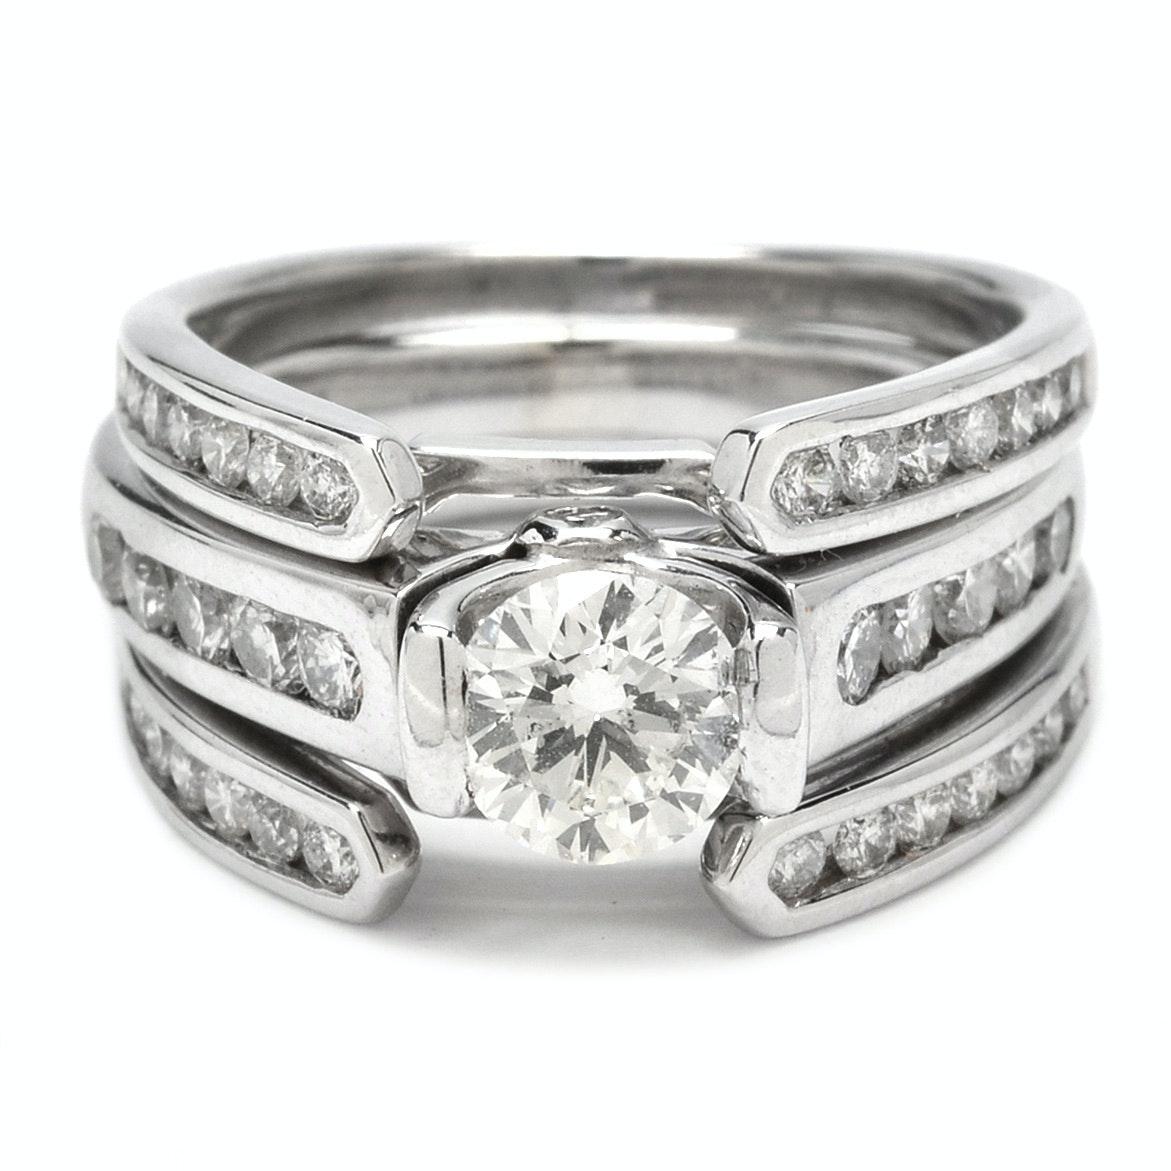 14K White Gold 1.43 CTW Diamond Engagement Ring with Diamond Enhancer